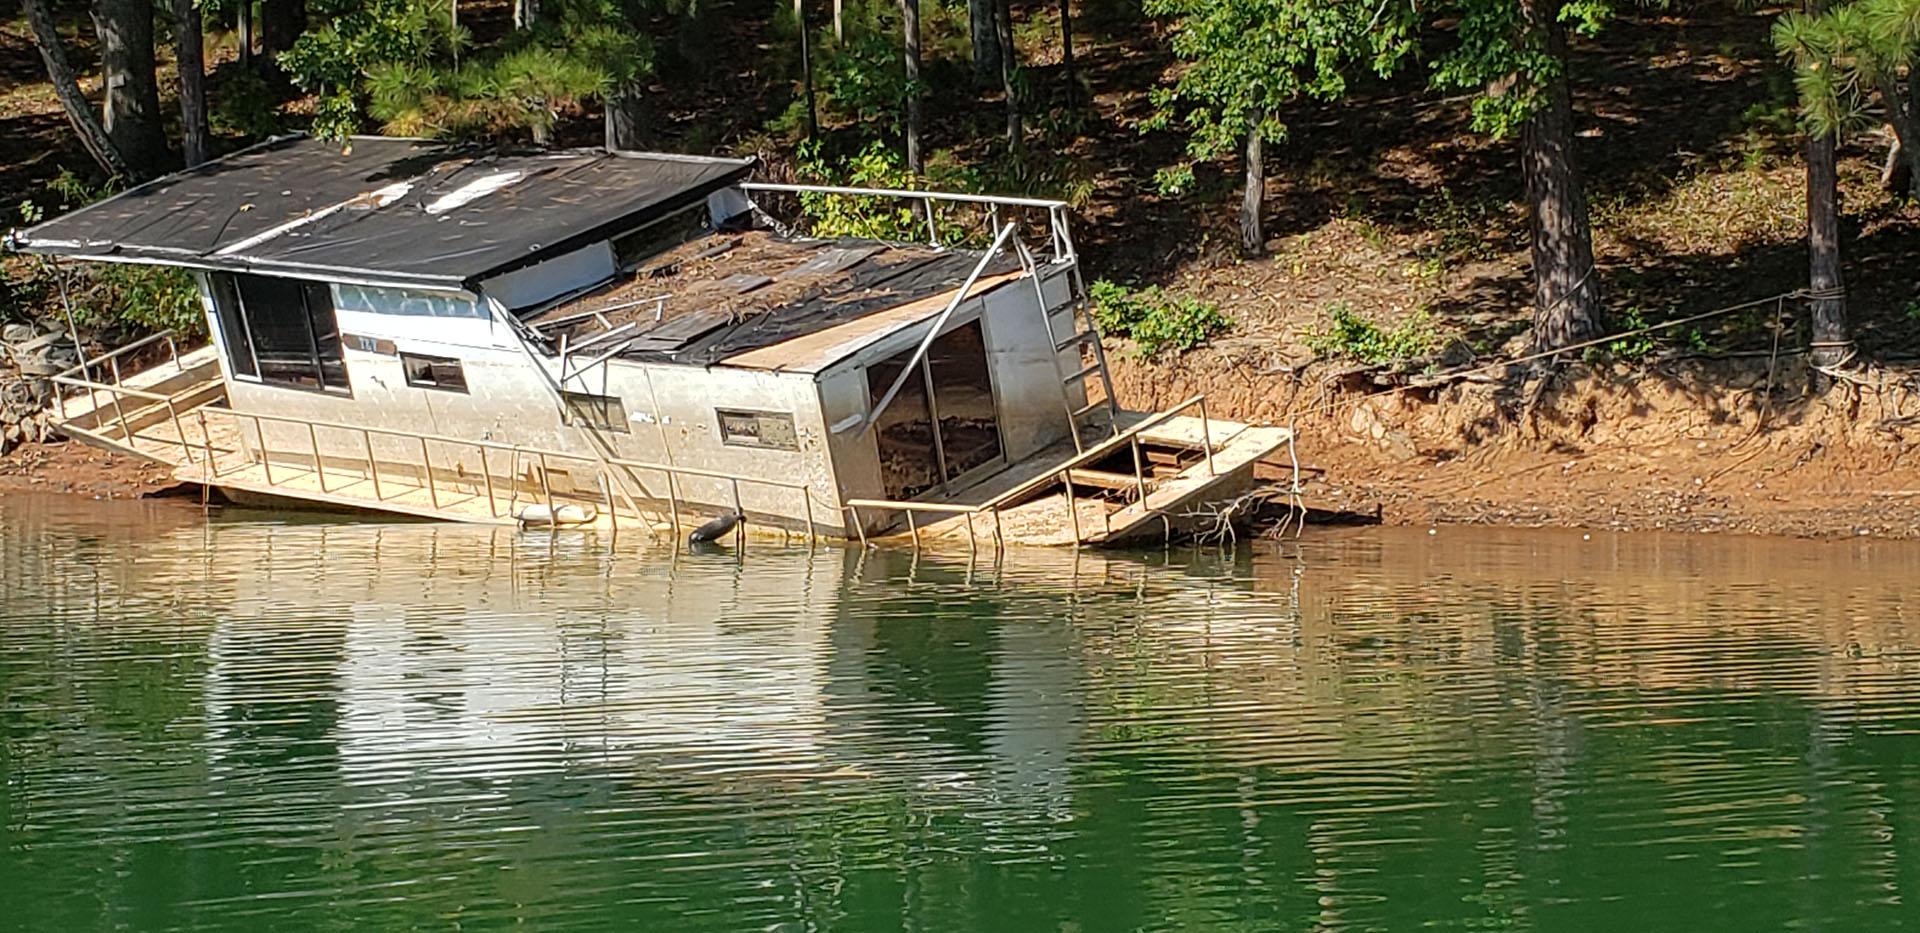 Large boat abandoned on the shore line of Lake Lanier